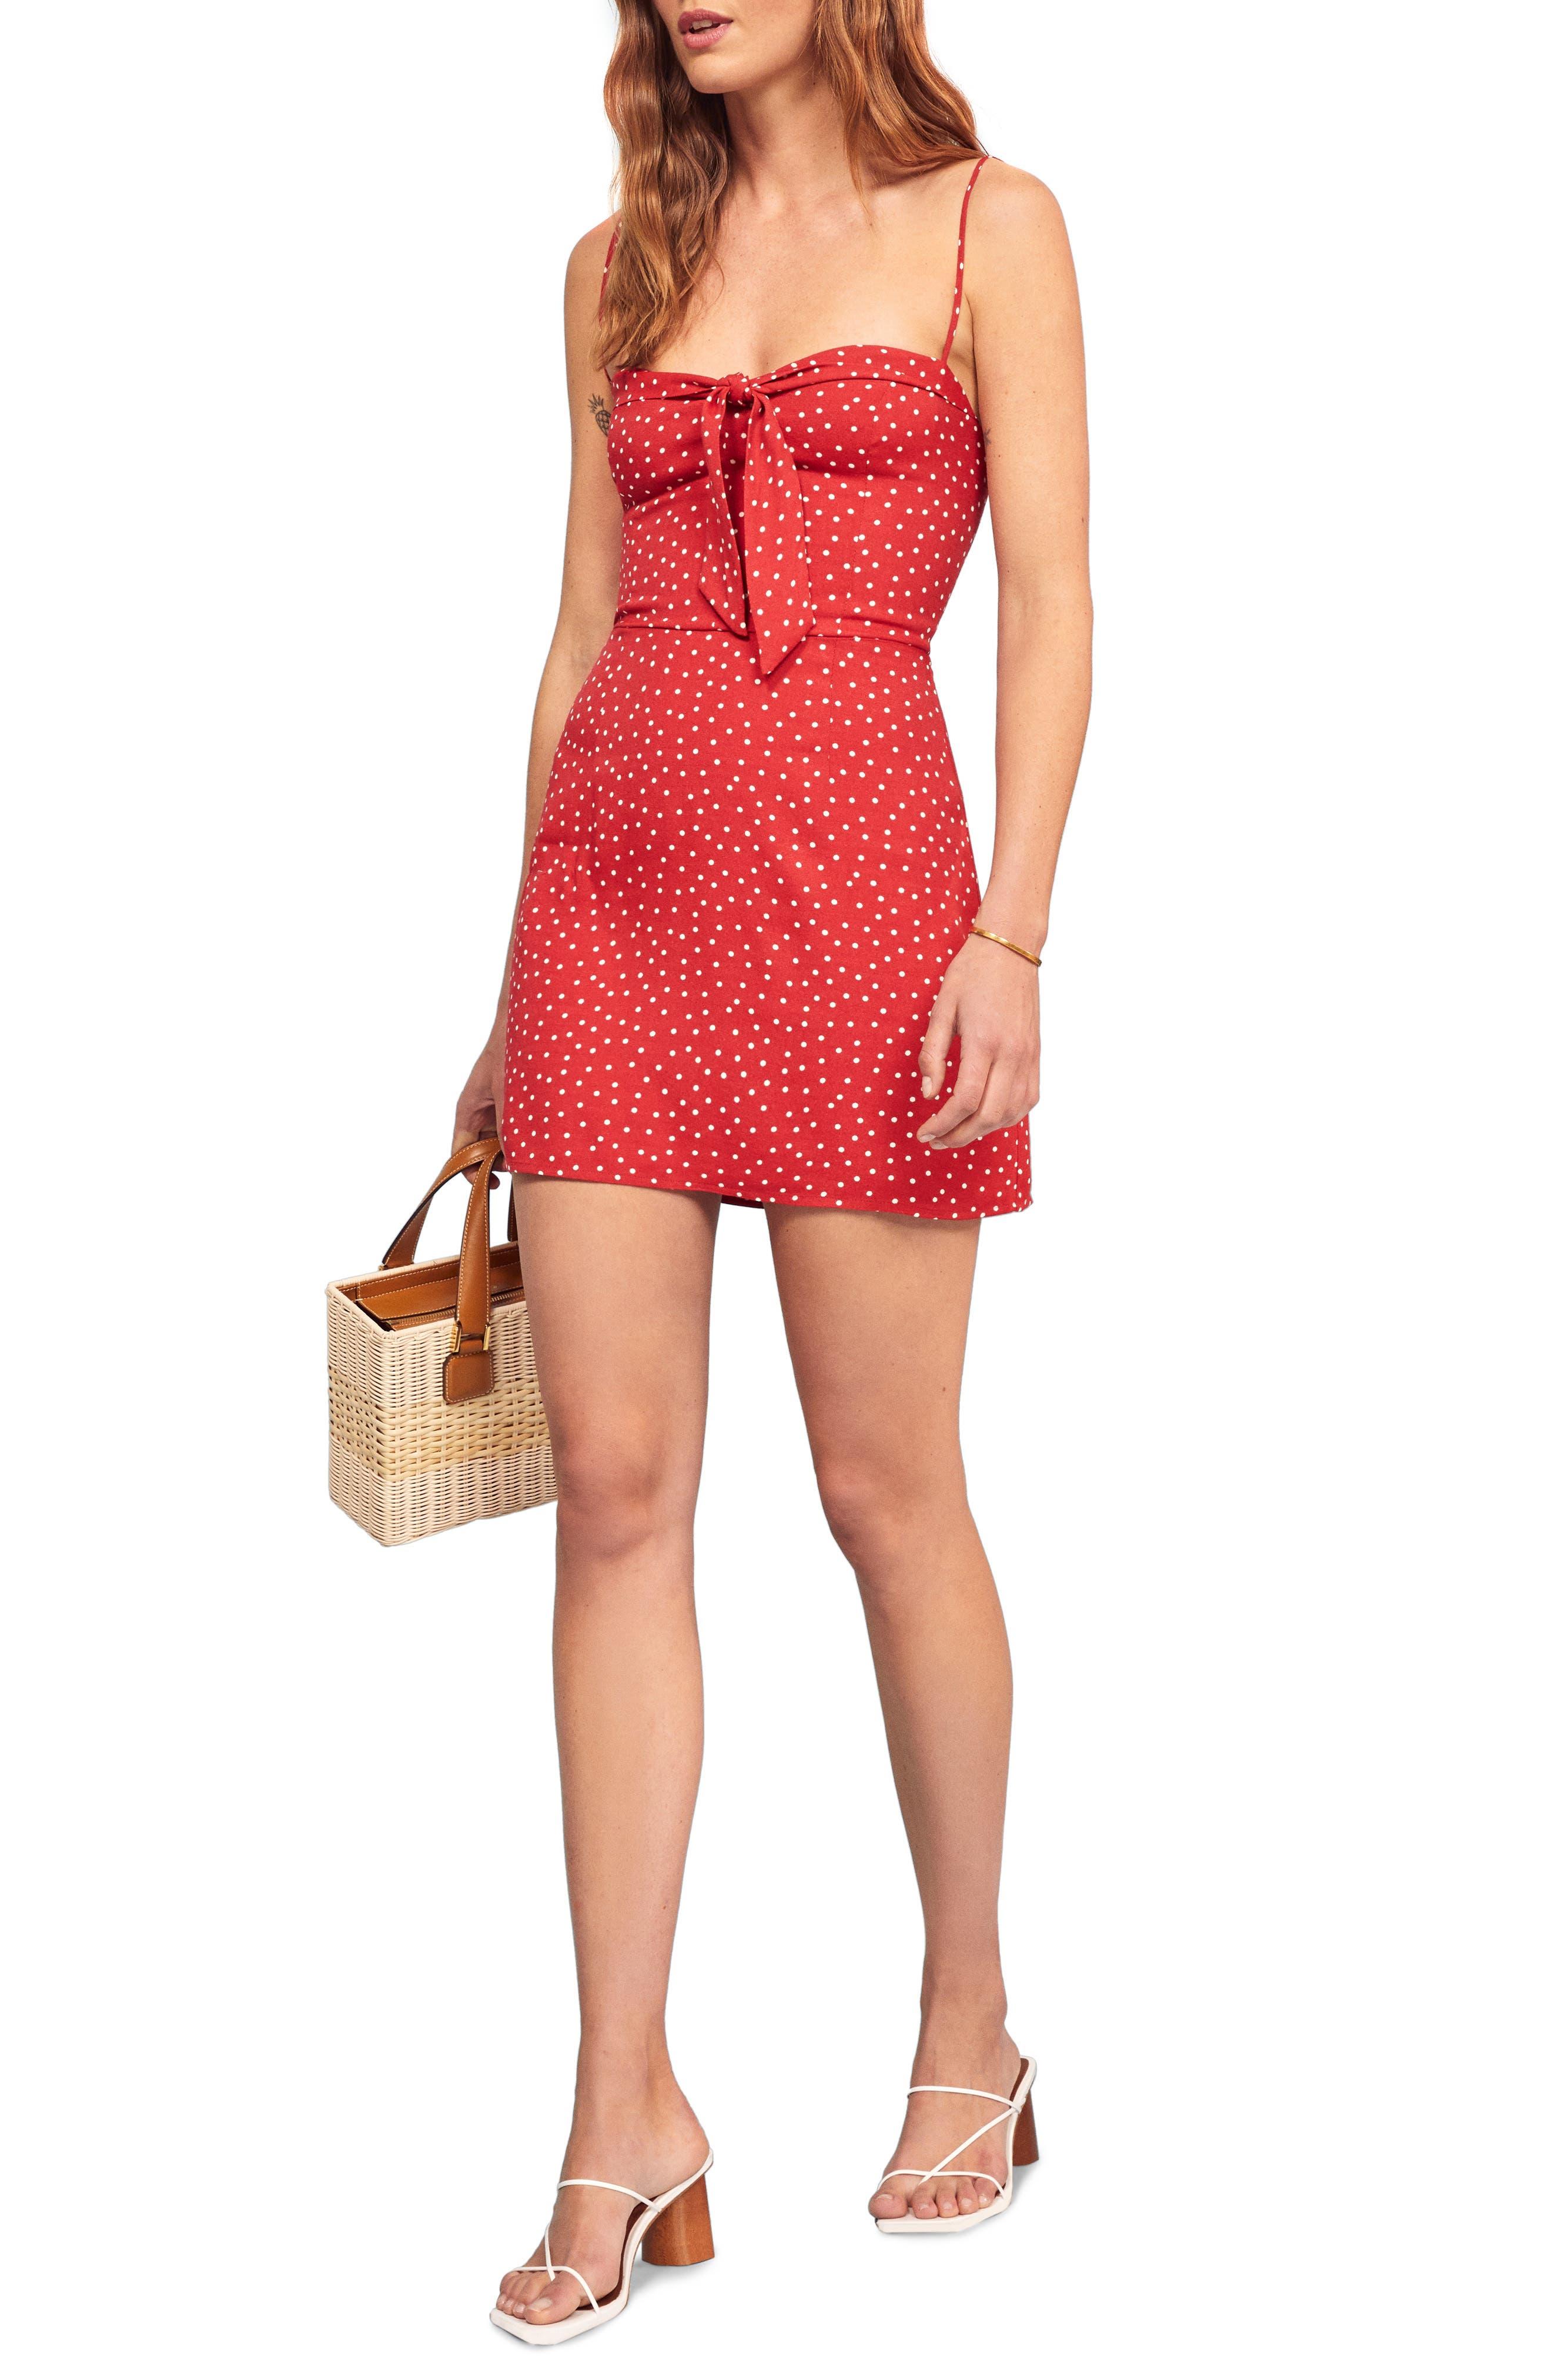 Reformation Helm Sleeveless Minidress, Red